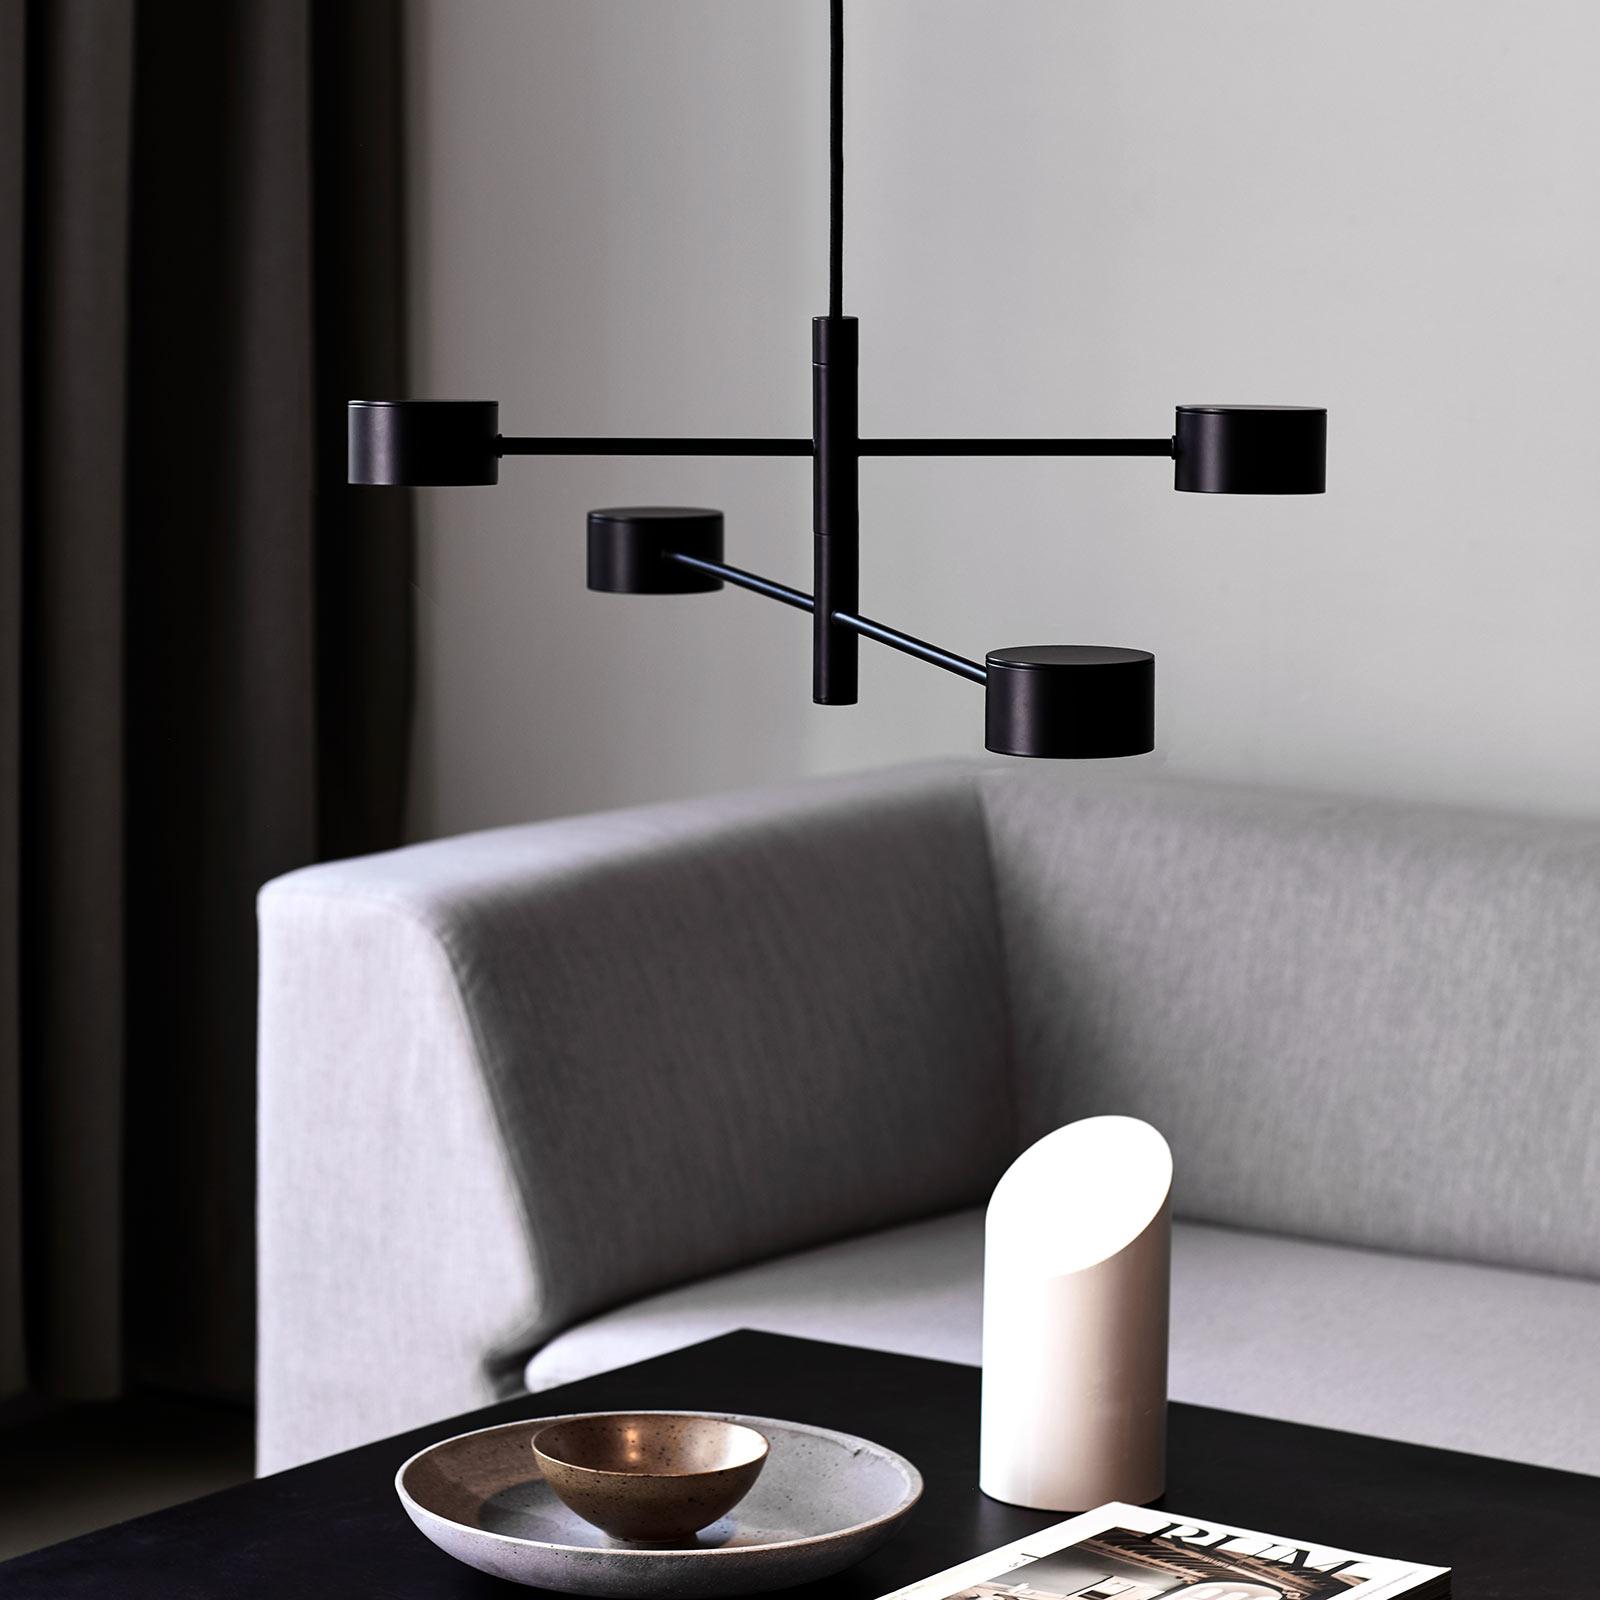 LED hanglamp Clyde, 4-lamps, tweetraps